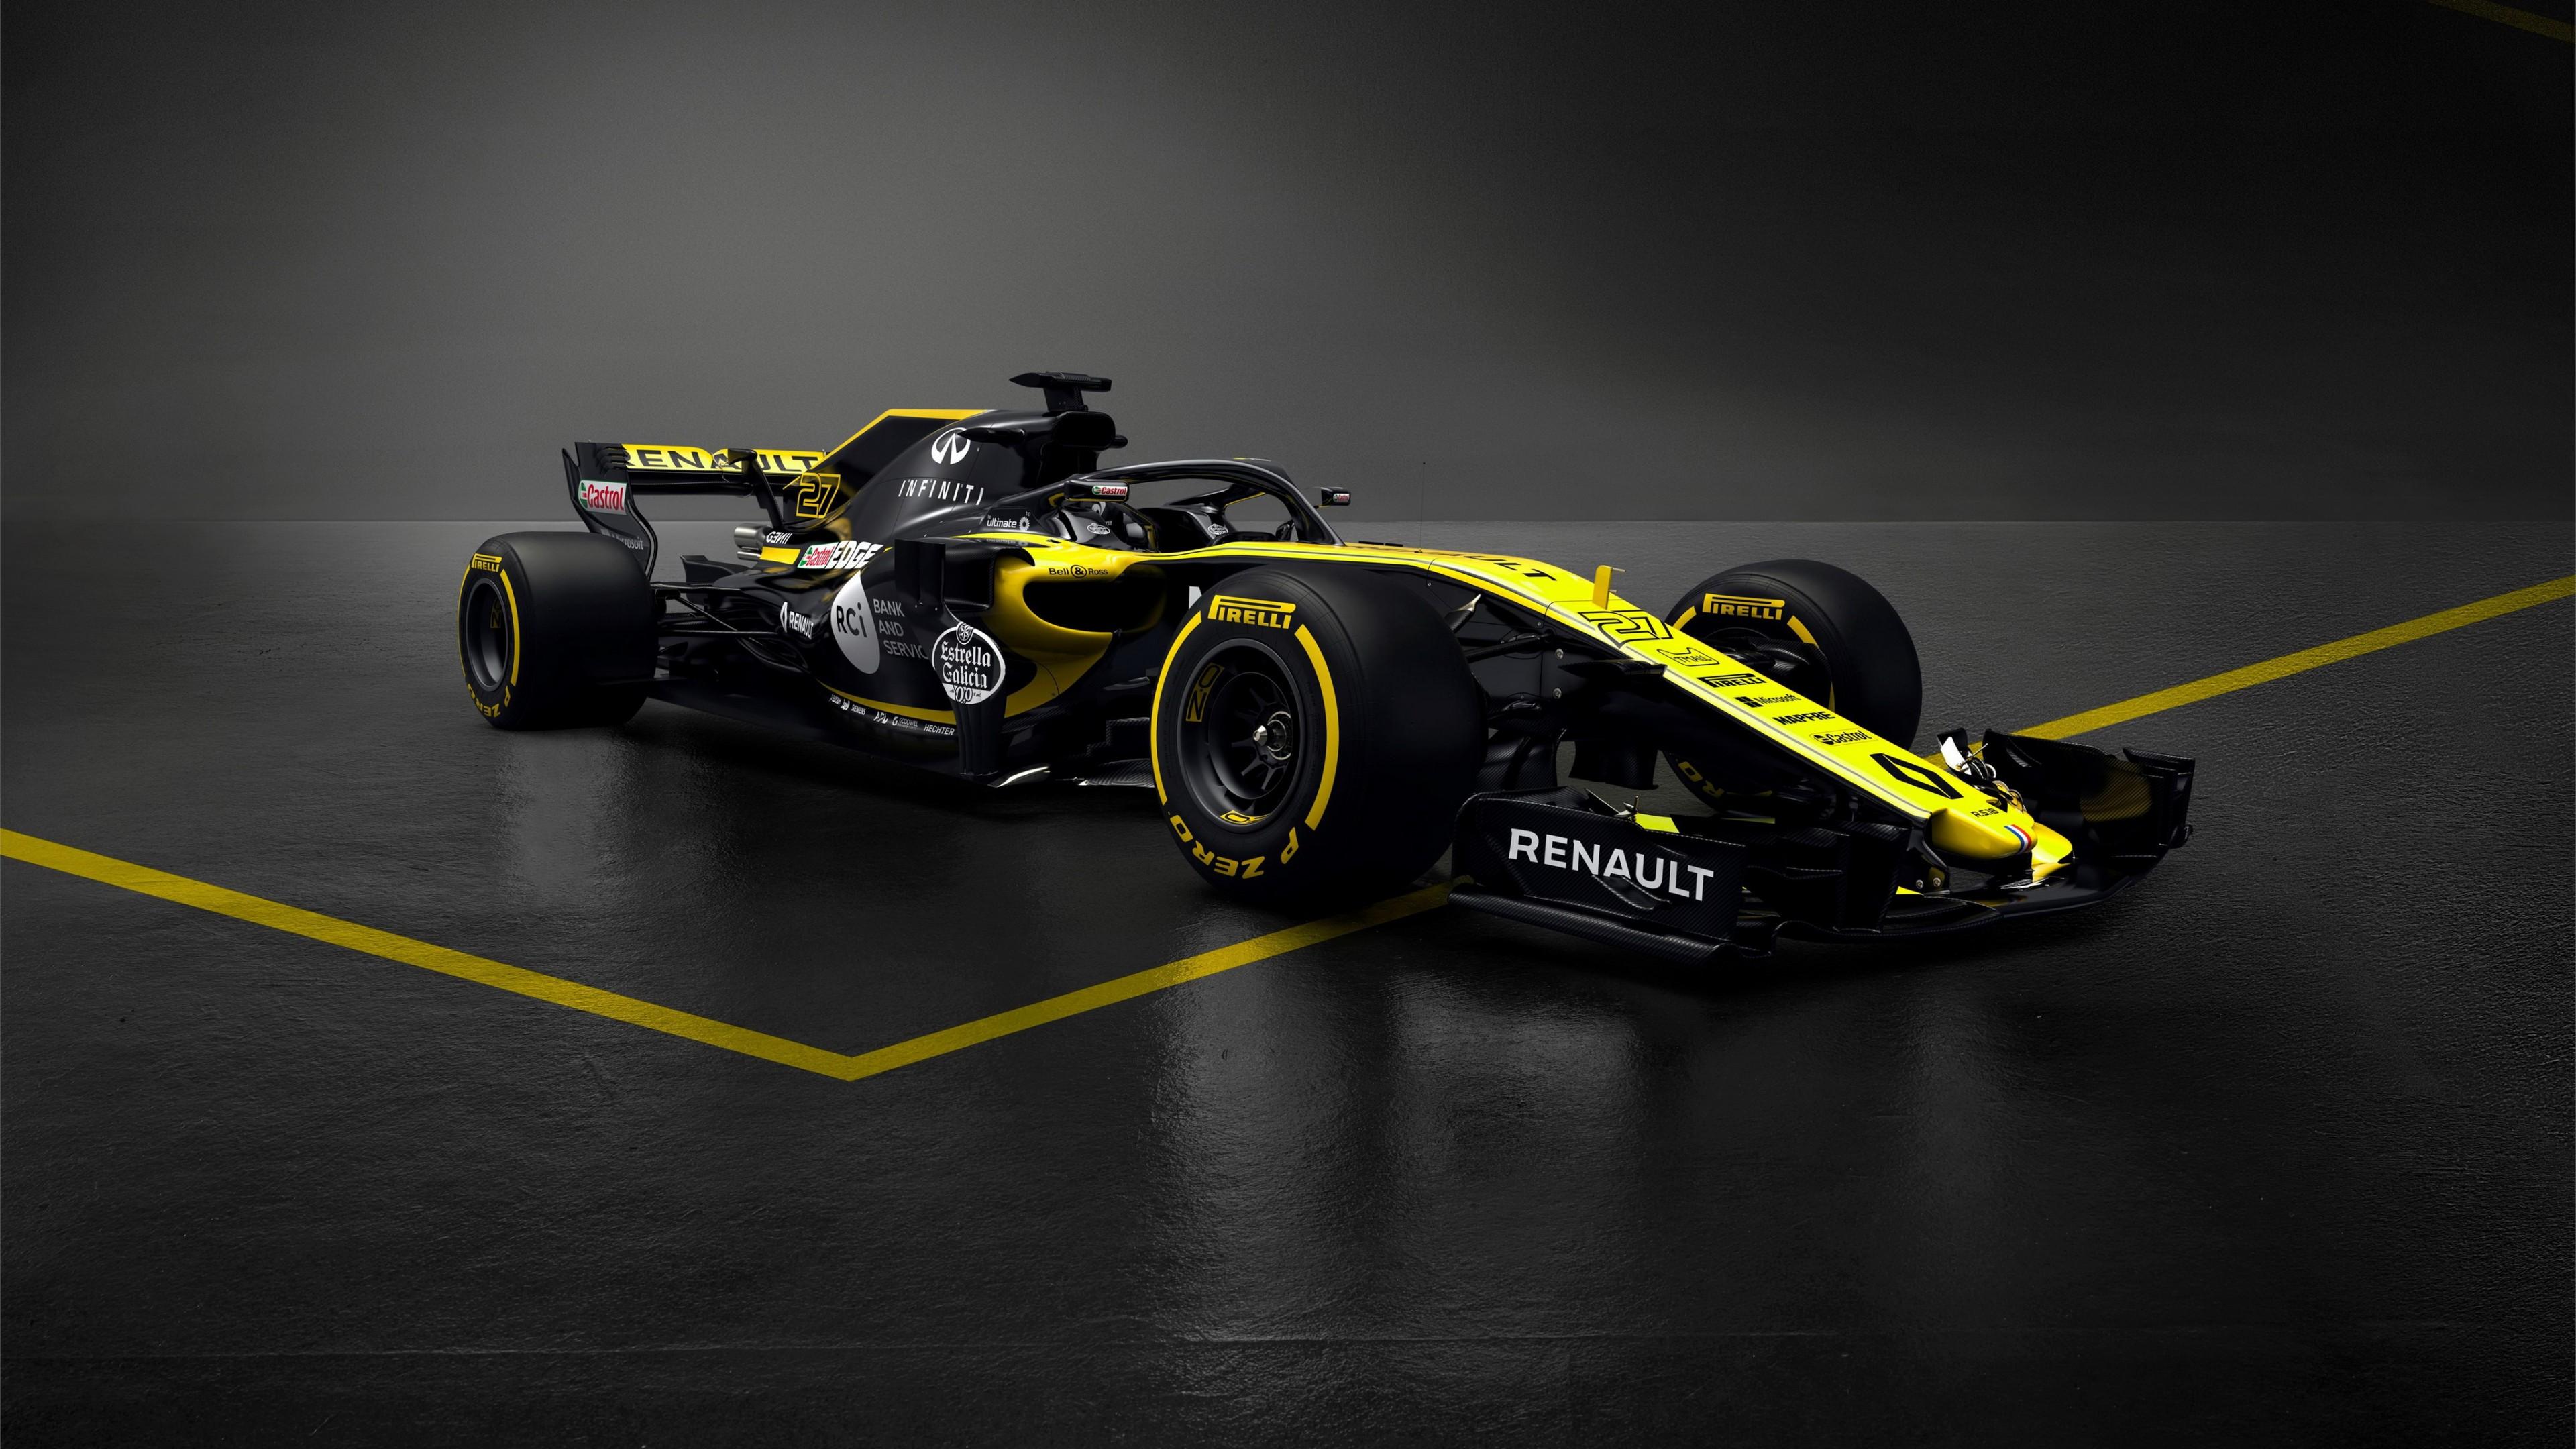 2018 Renault RS18 F1 Formula 1 Car 4K 2 Wallpaper   HD Car ...